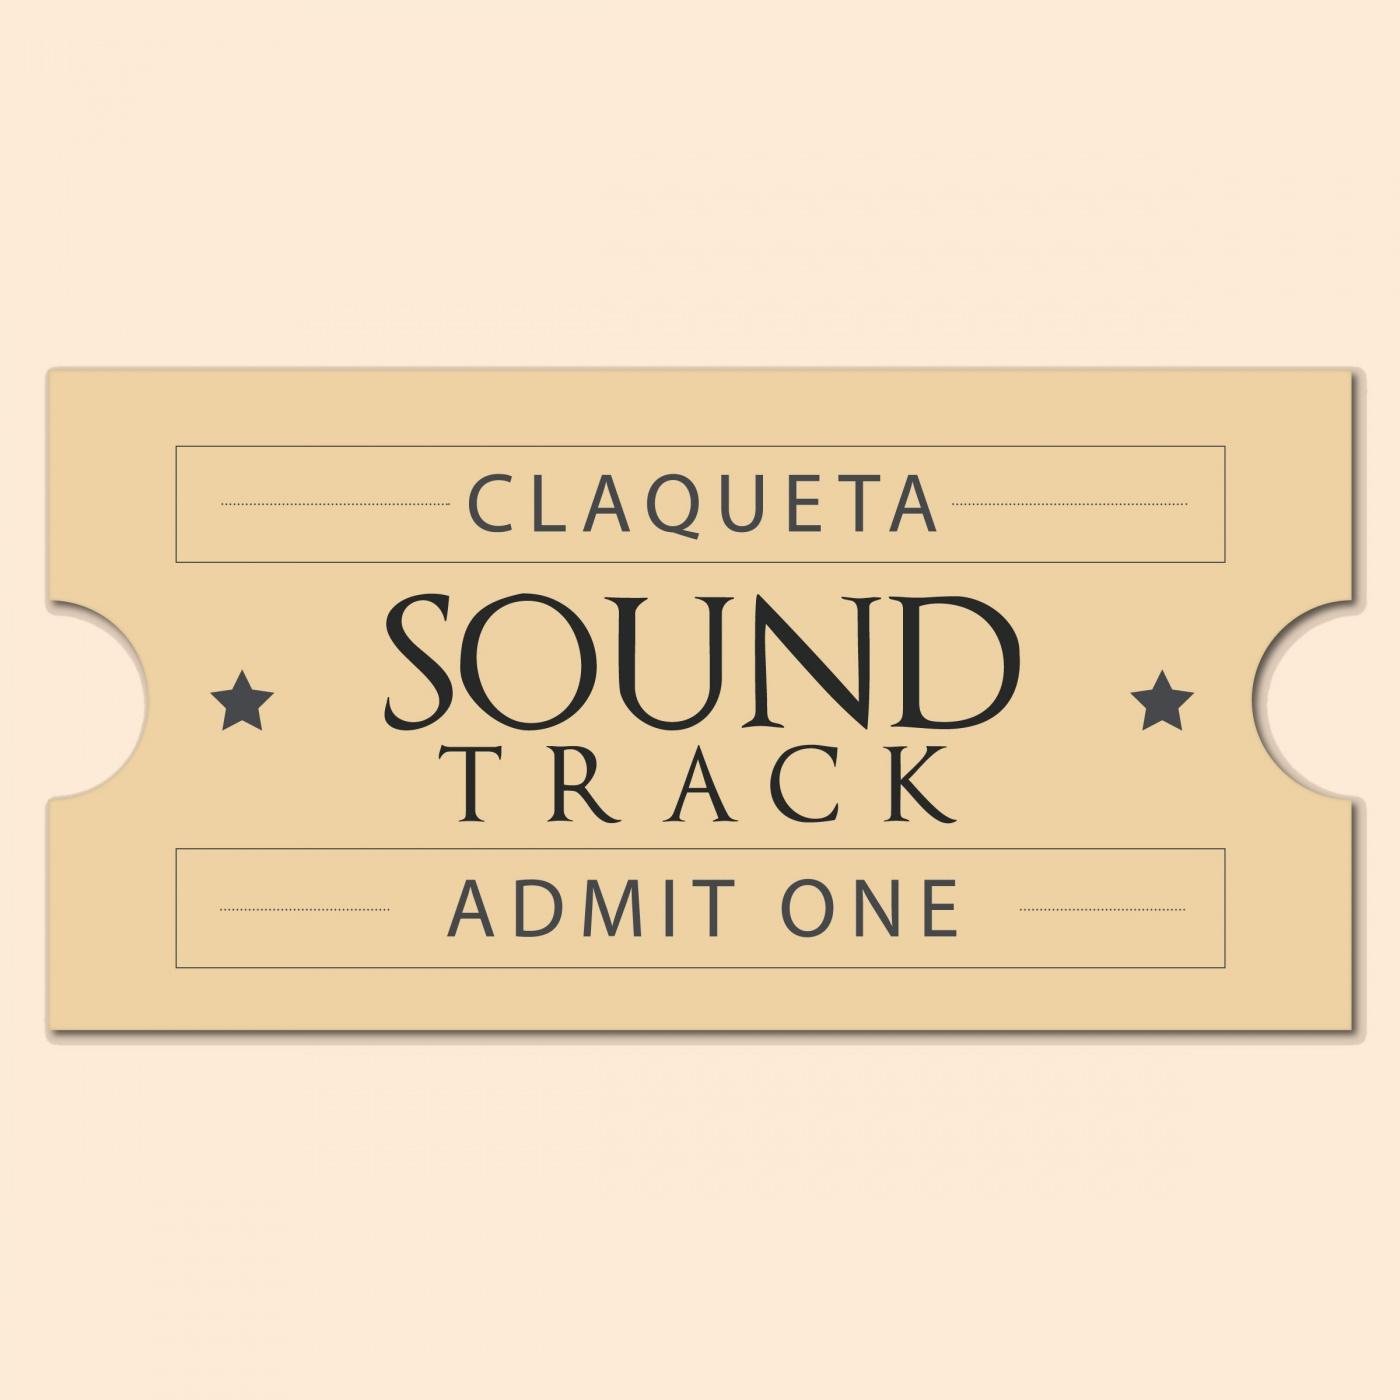 Claqueta Sountrack